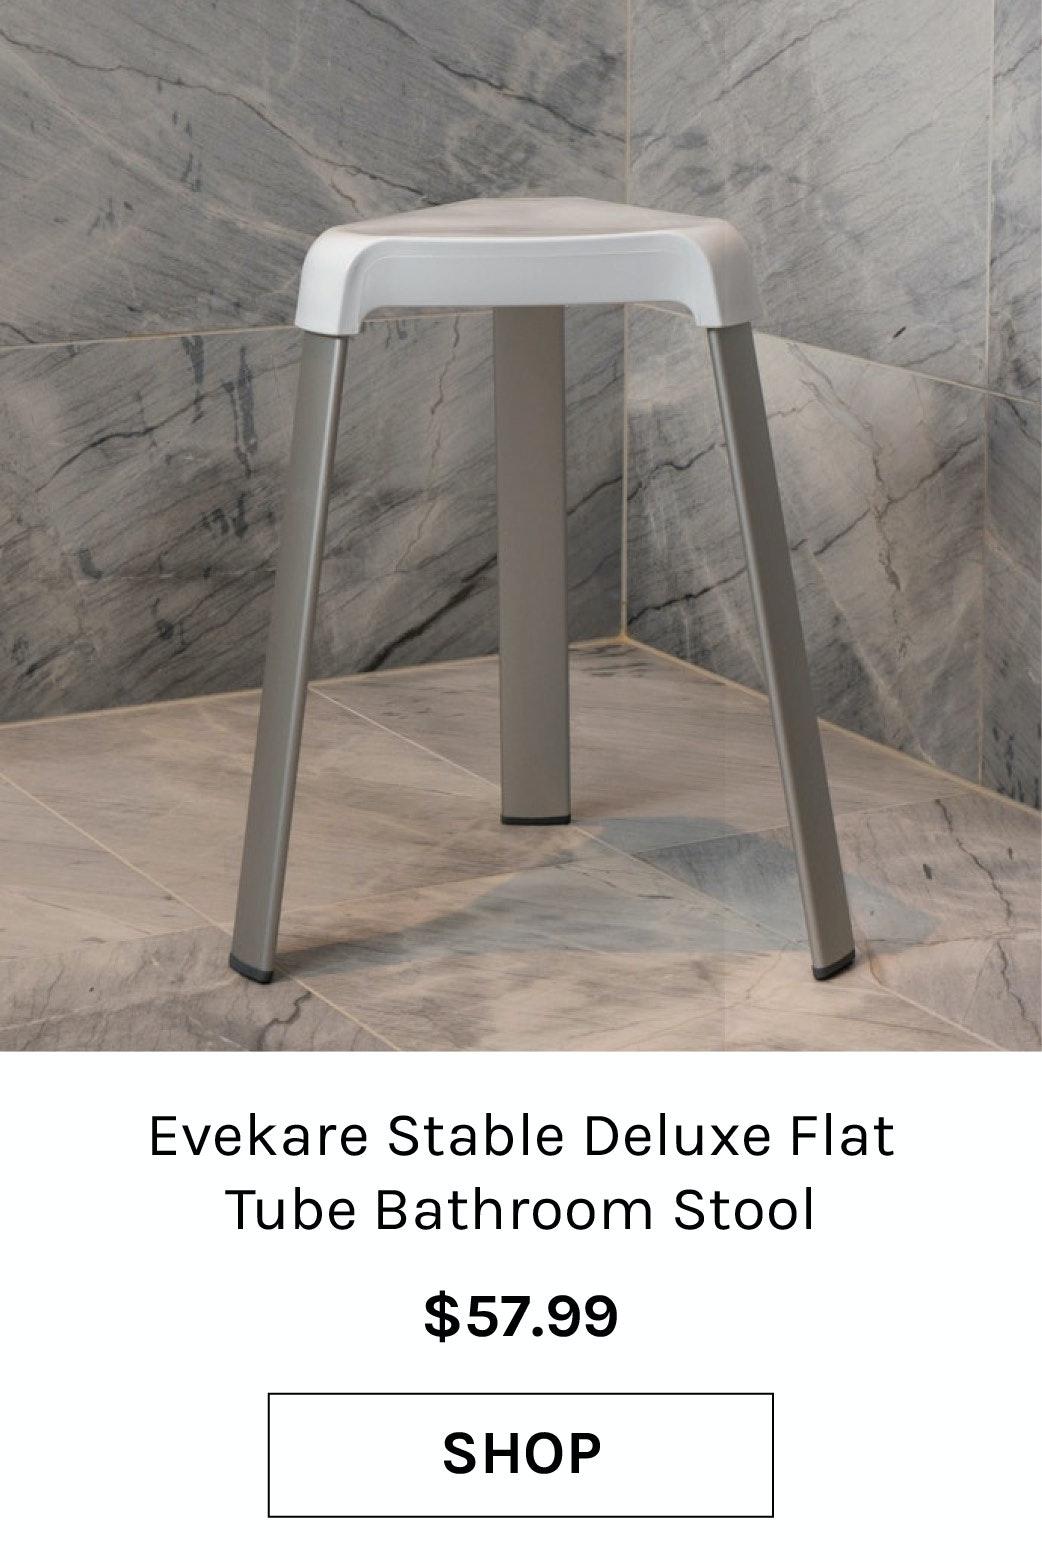 Evekare Stable Deluxe Flat Tube Bathroom Stool Shower Seating Three-Legged White